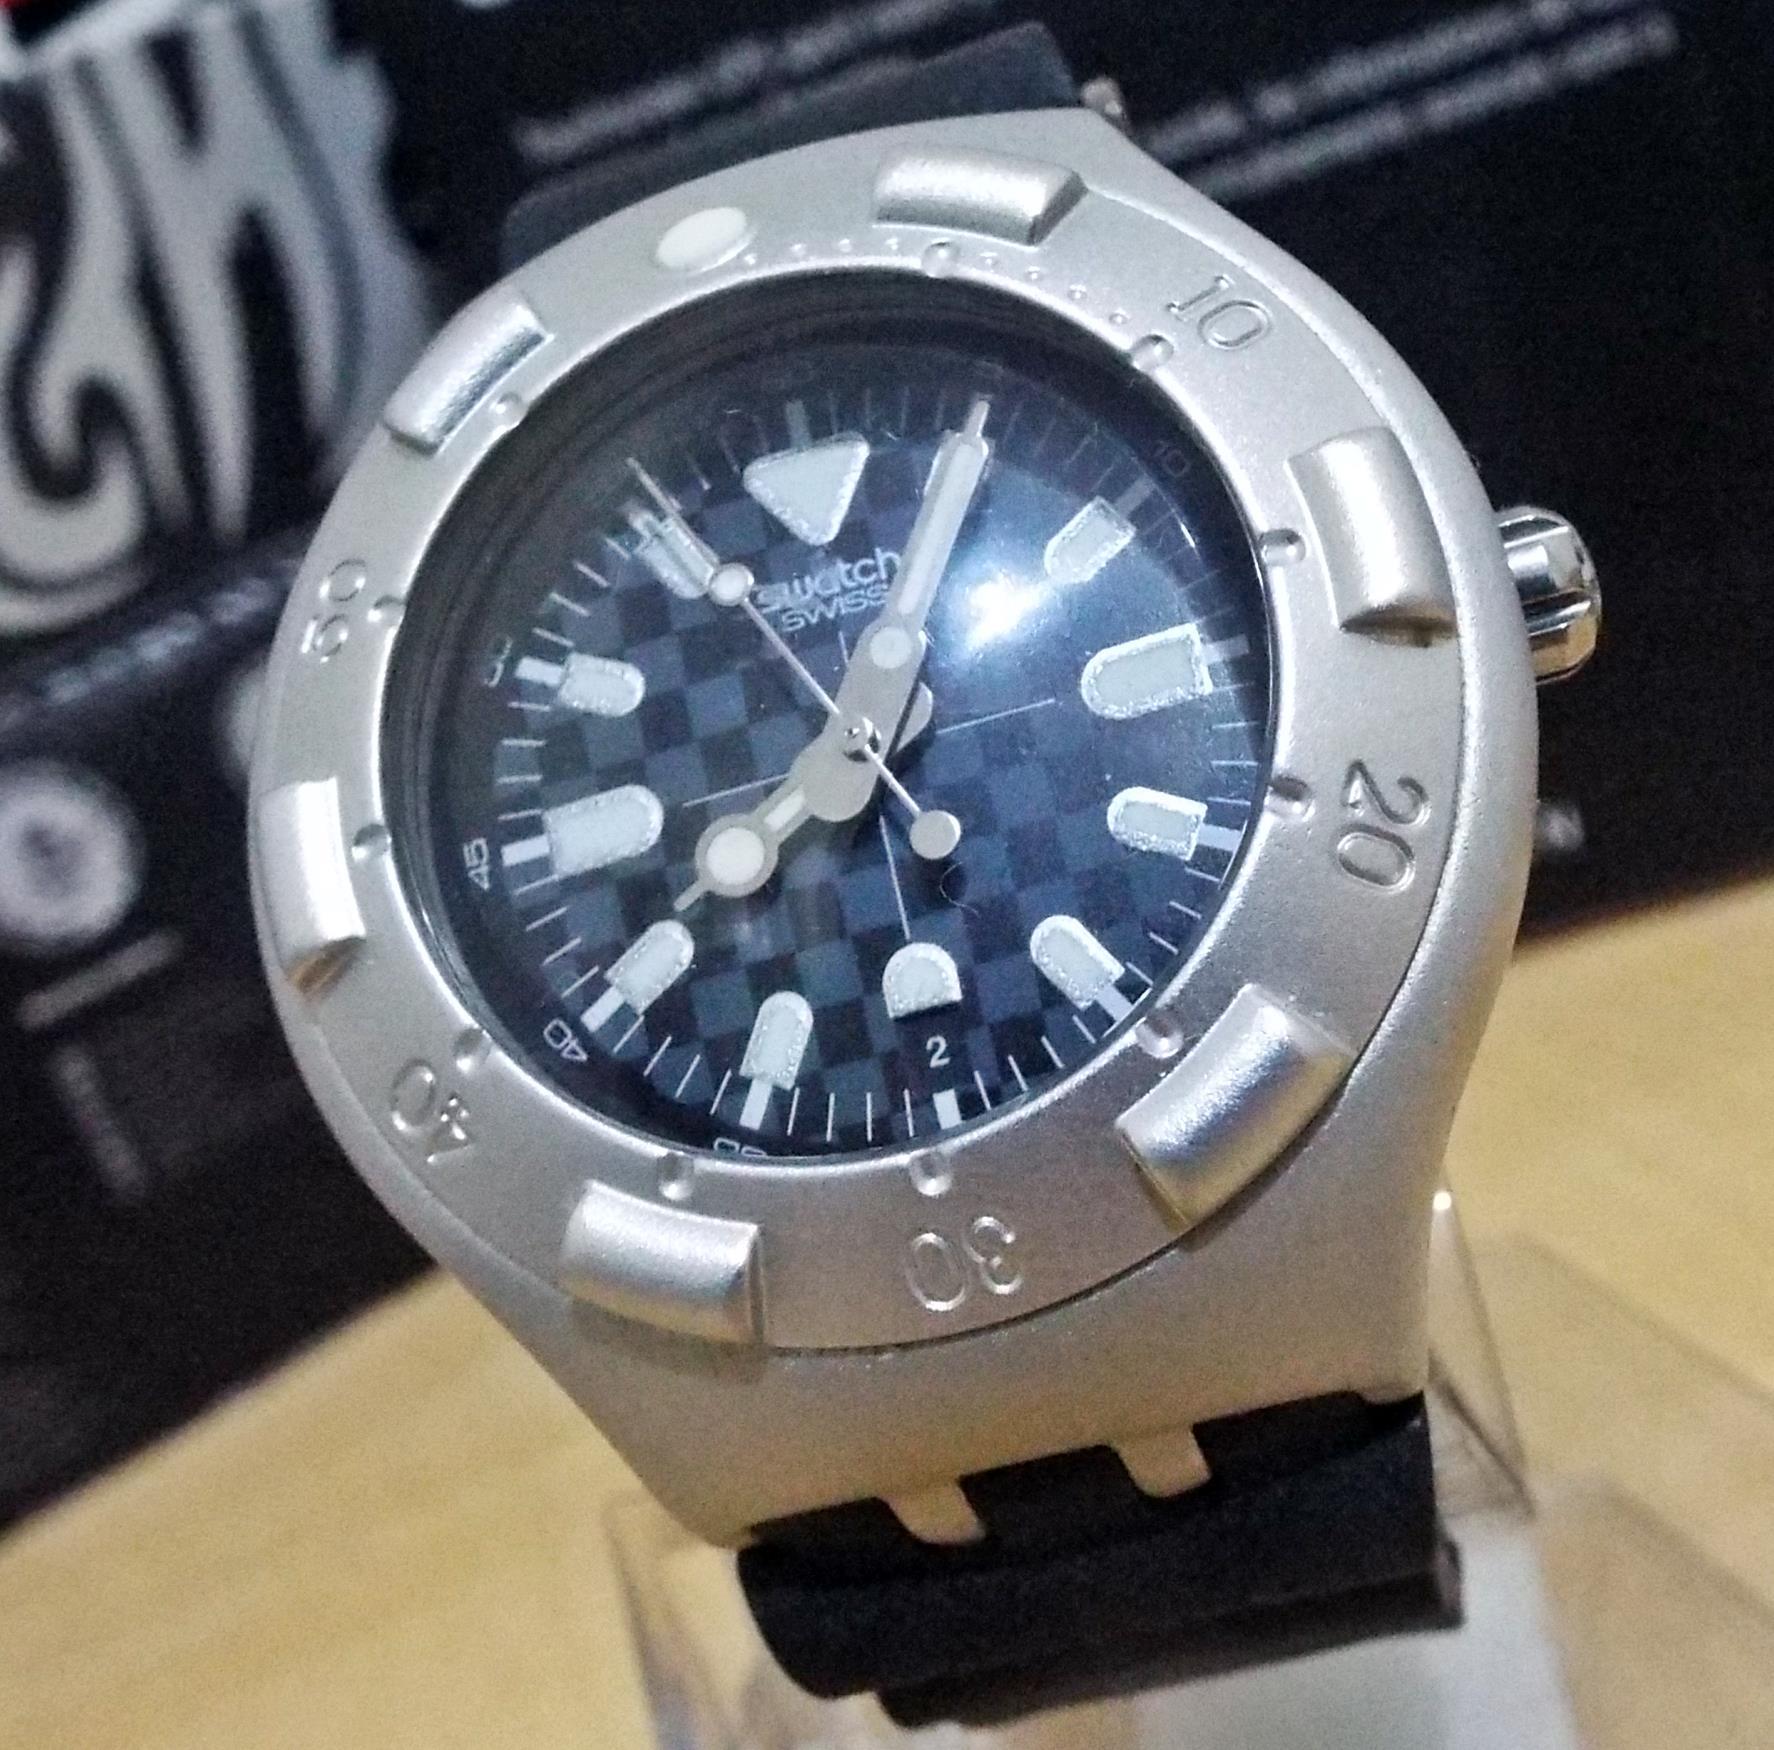 Jual swatch vortex obscure irony scuba 200 alumunium dive - Swatch dive watch ...